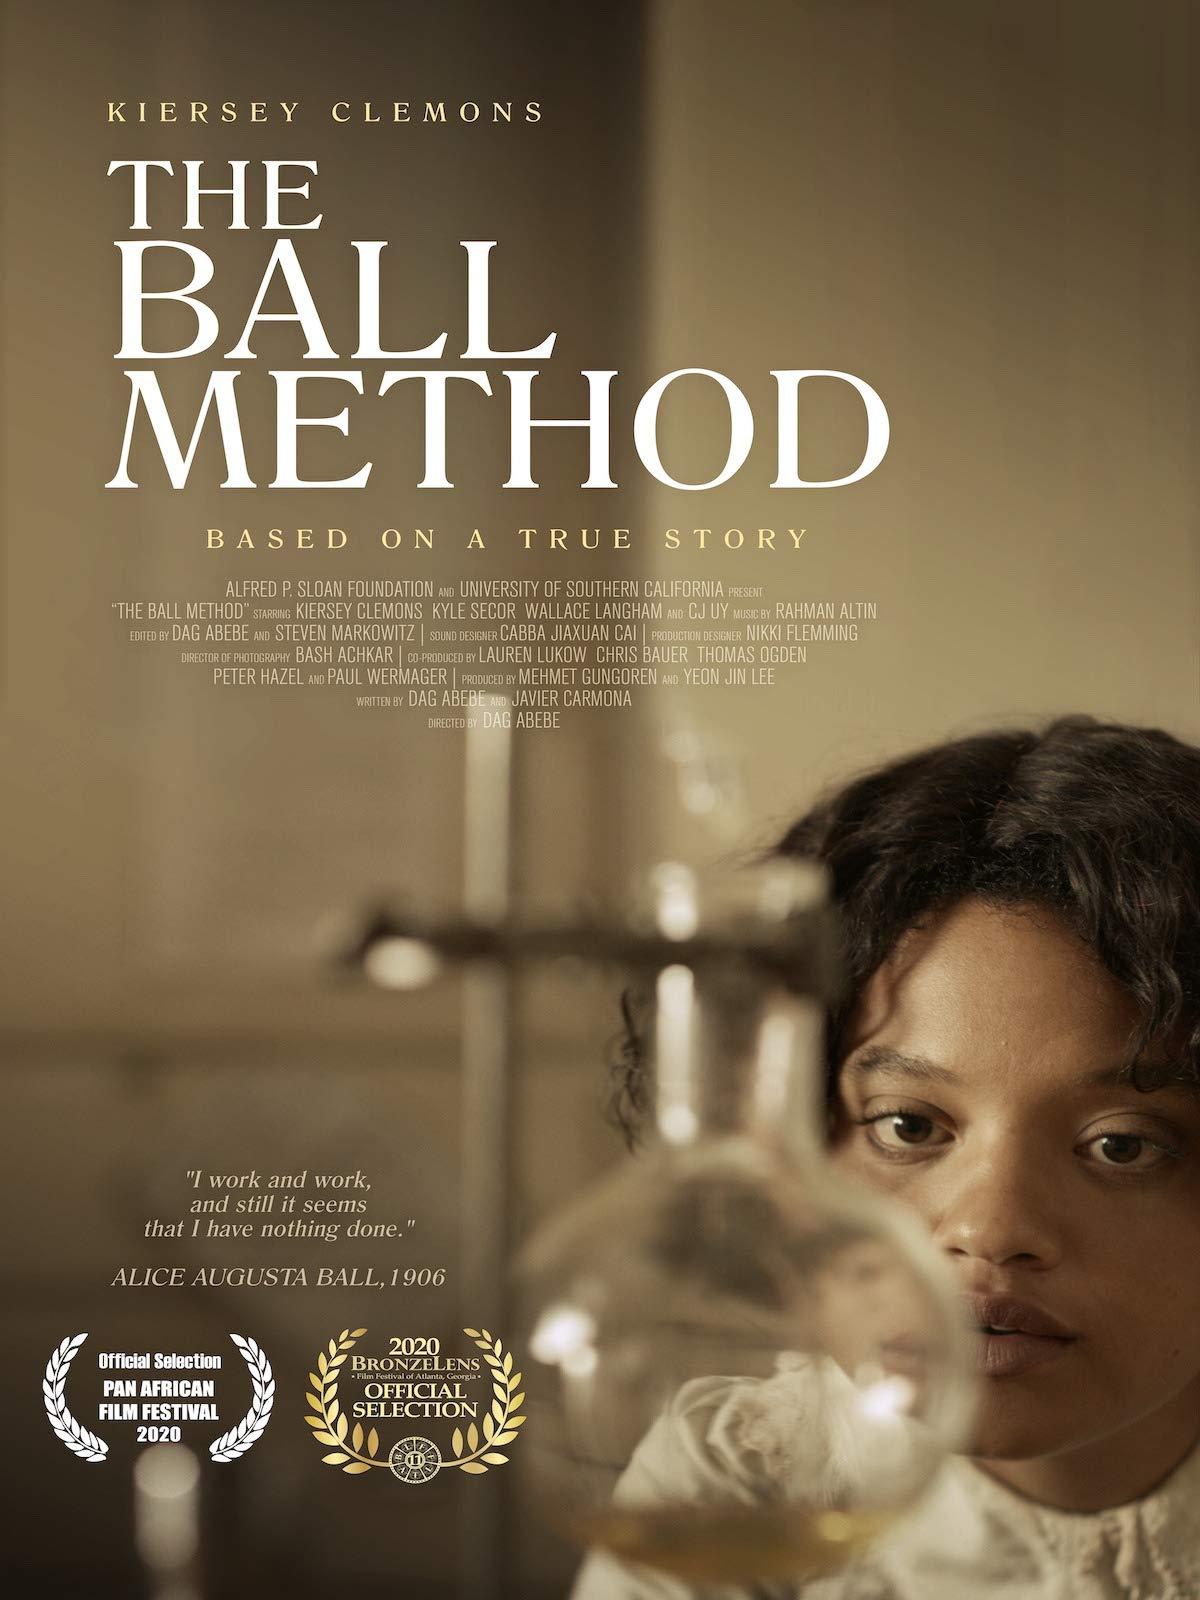 The Ball Method